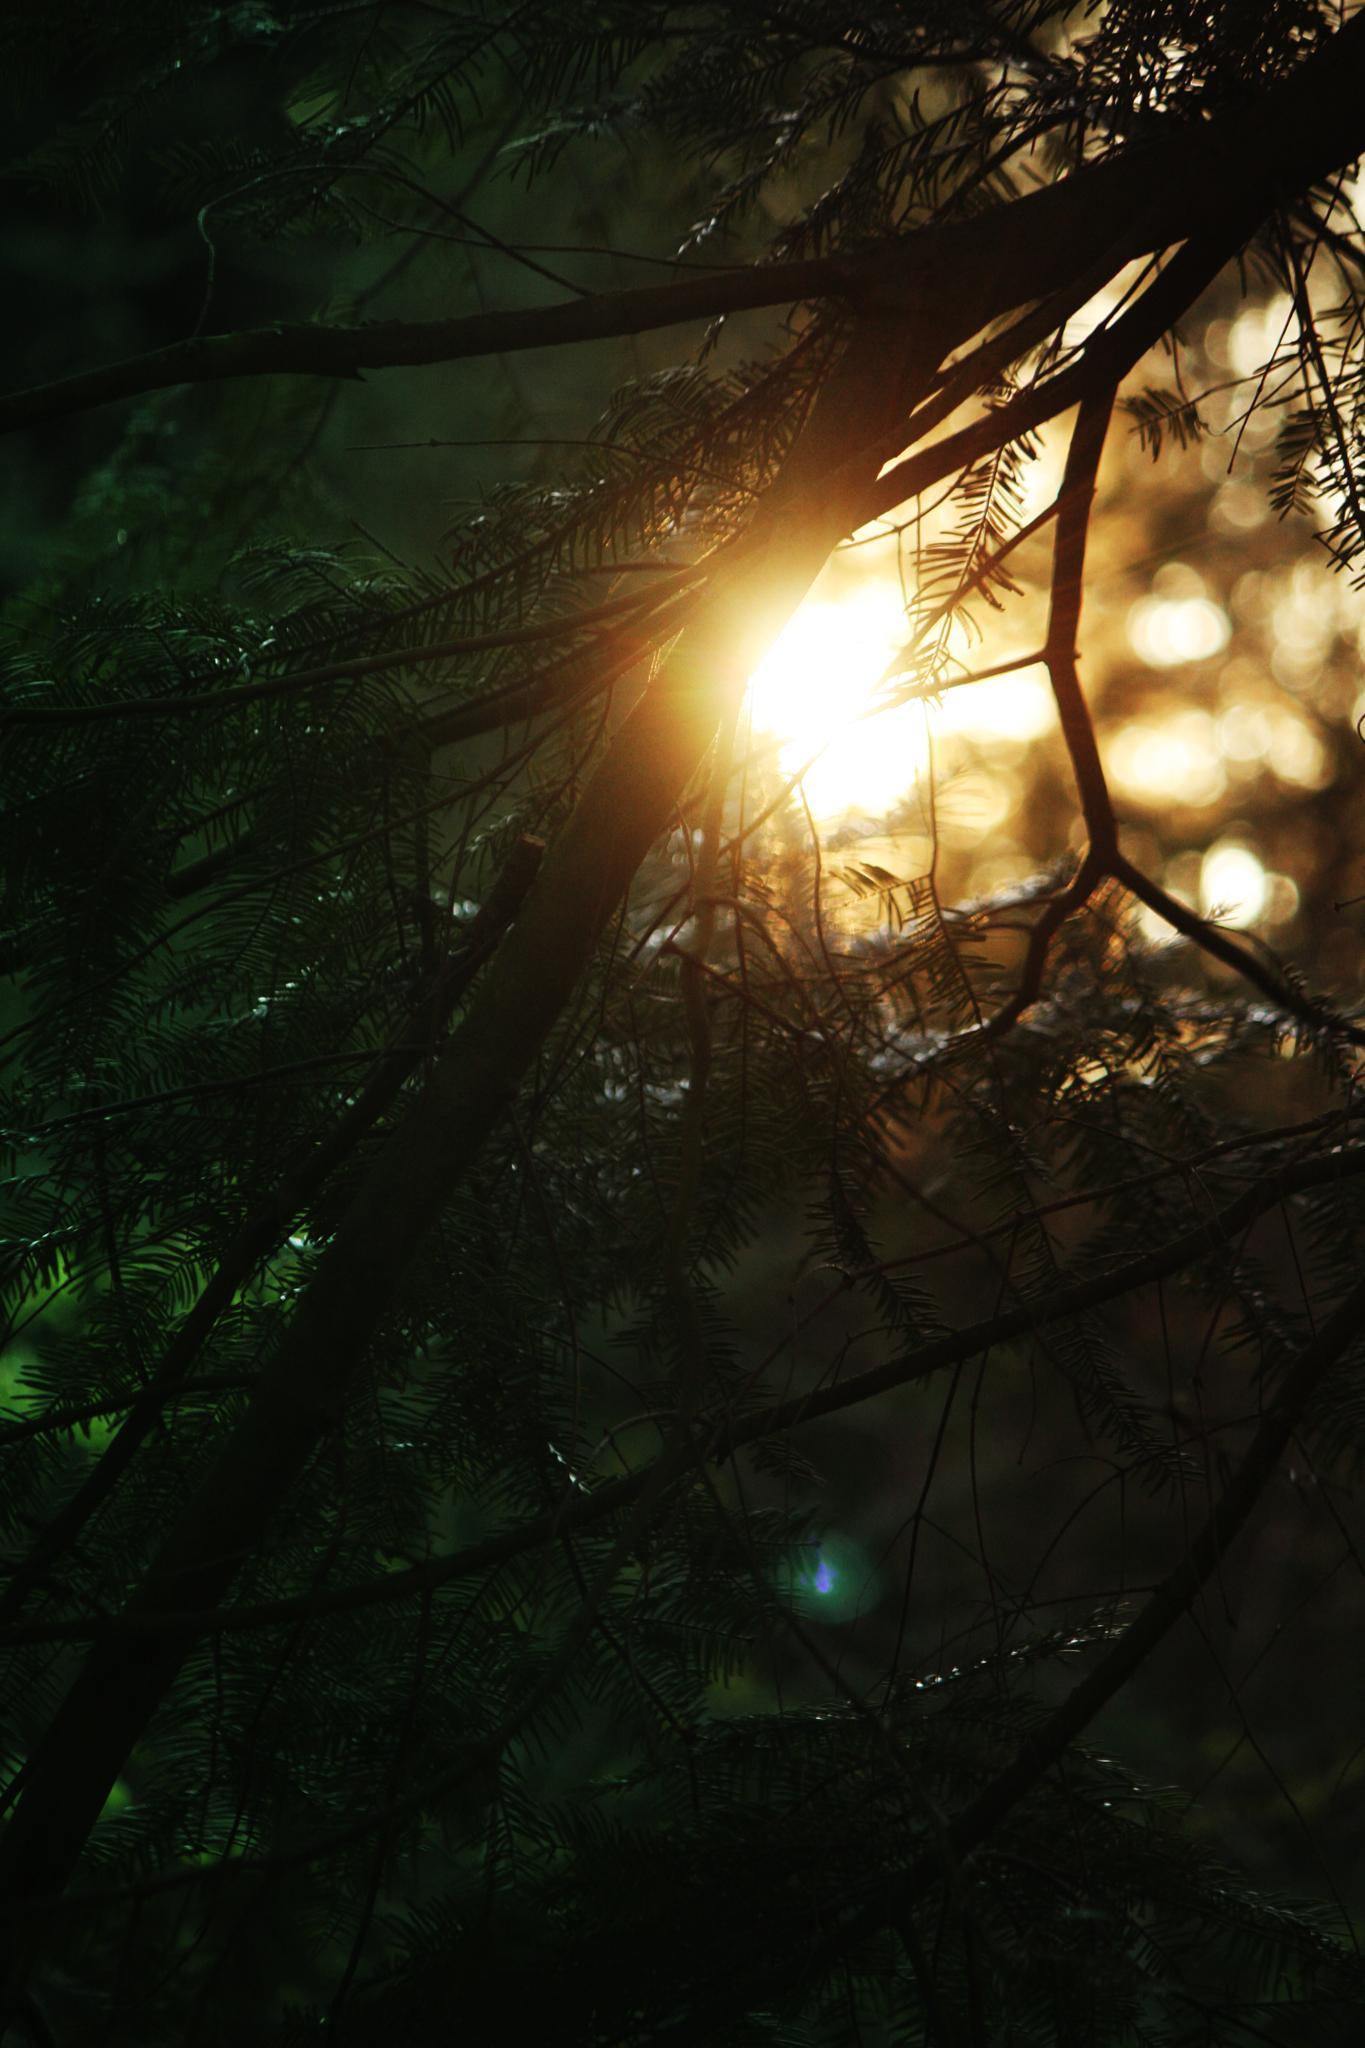 Pikaboo says the sun by snezana.lindskog